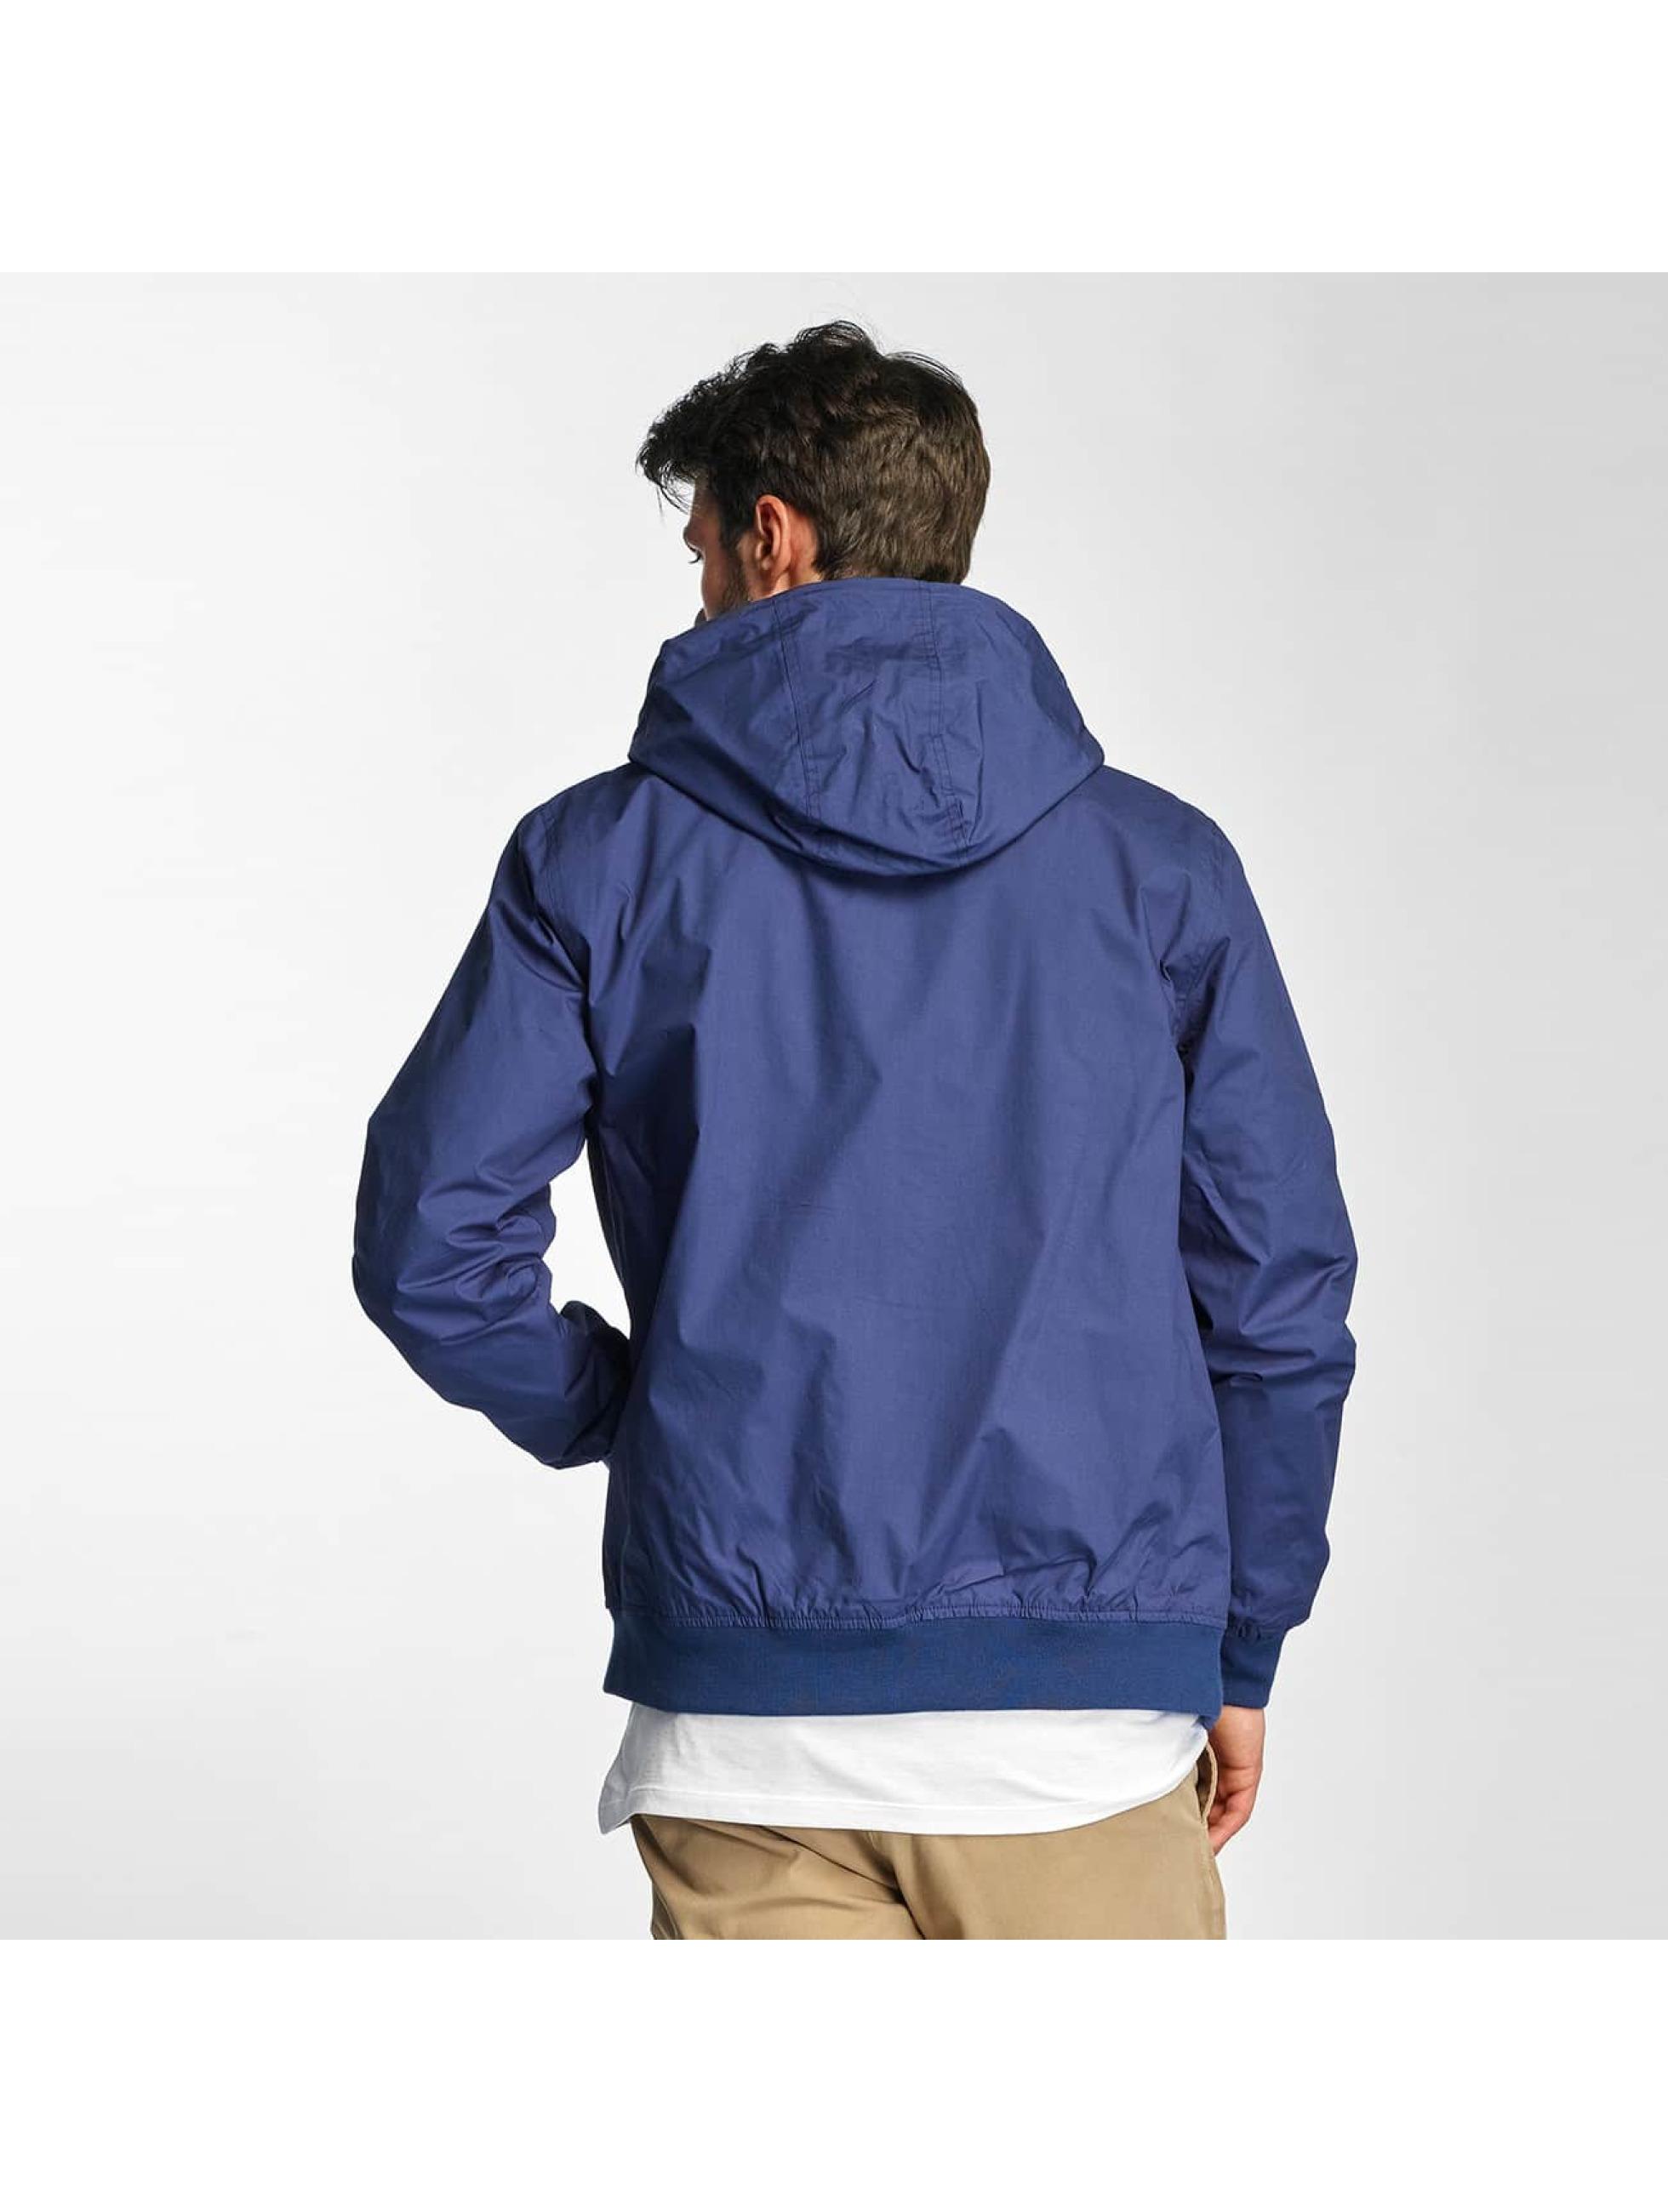 Carhartt WIP Lightweight Jacket Marsh Cotton Poplin blue